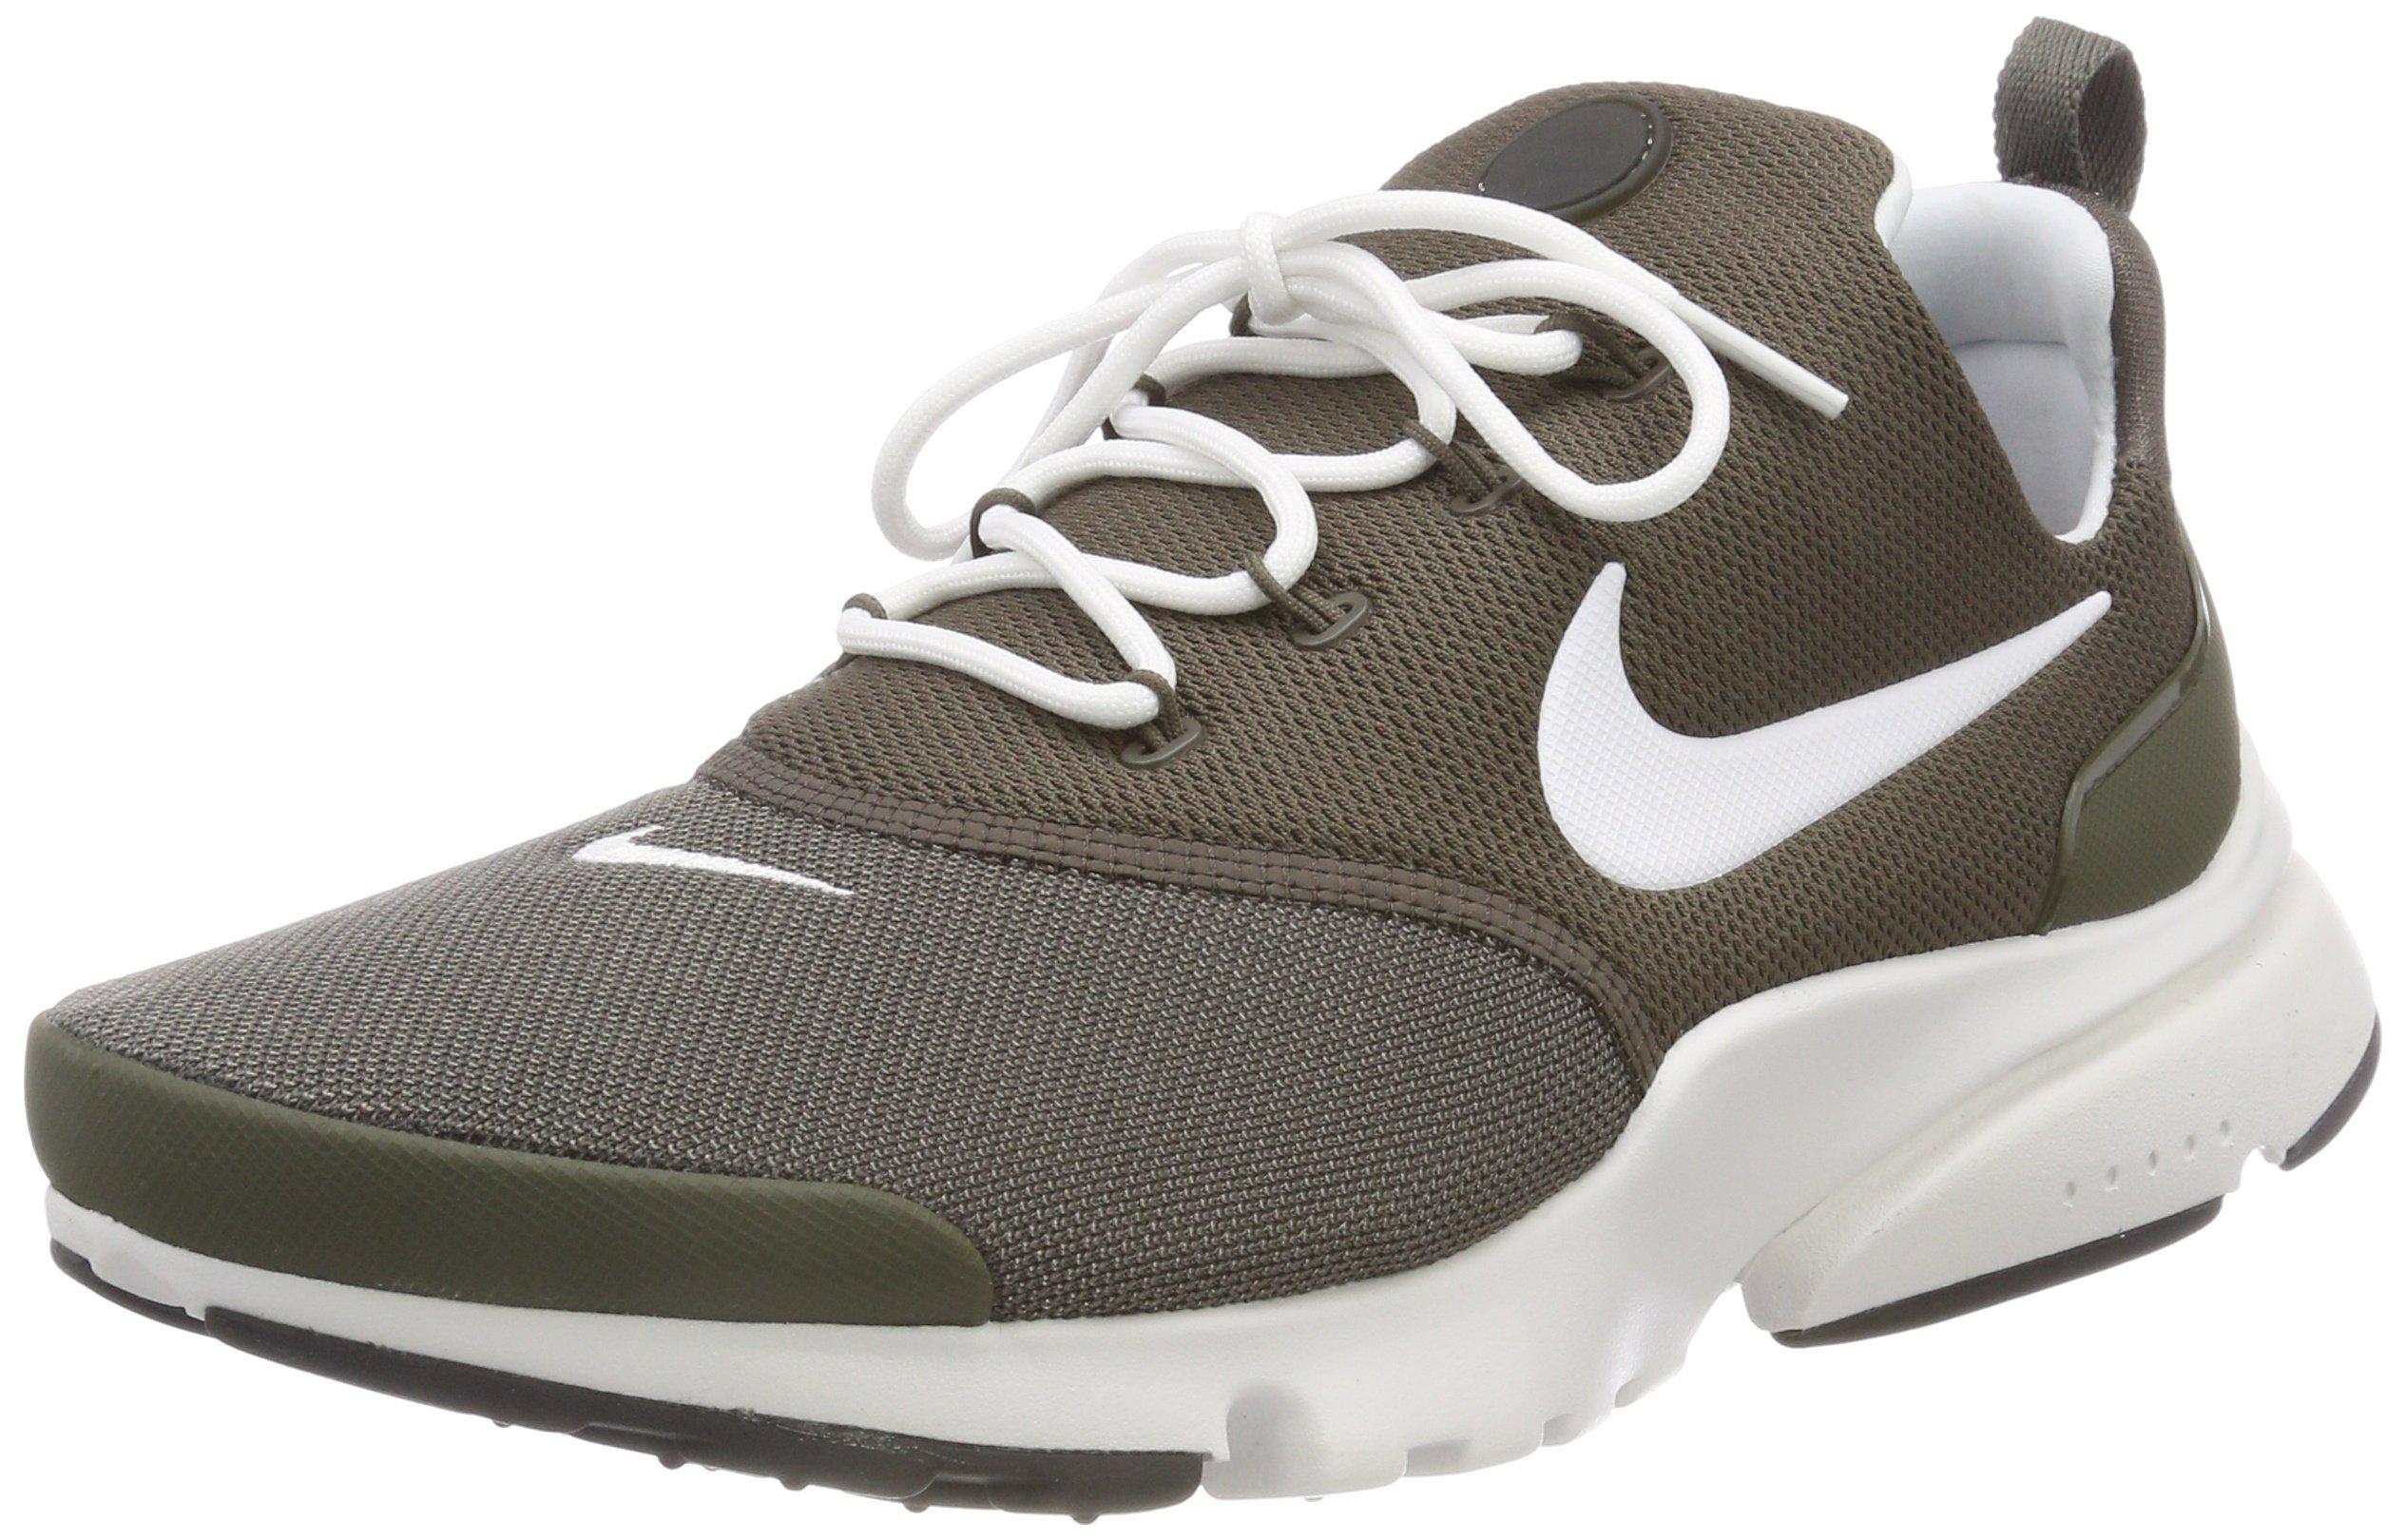 49e420e76e7e6a Galleon - NIKE Presto Fly SE Mens Running Trainers 908020 Sneakers Shoes (UK  7.5 US 8.5 EU 42